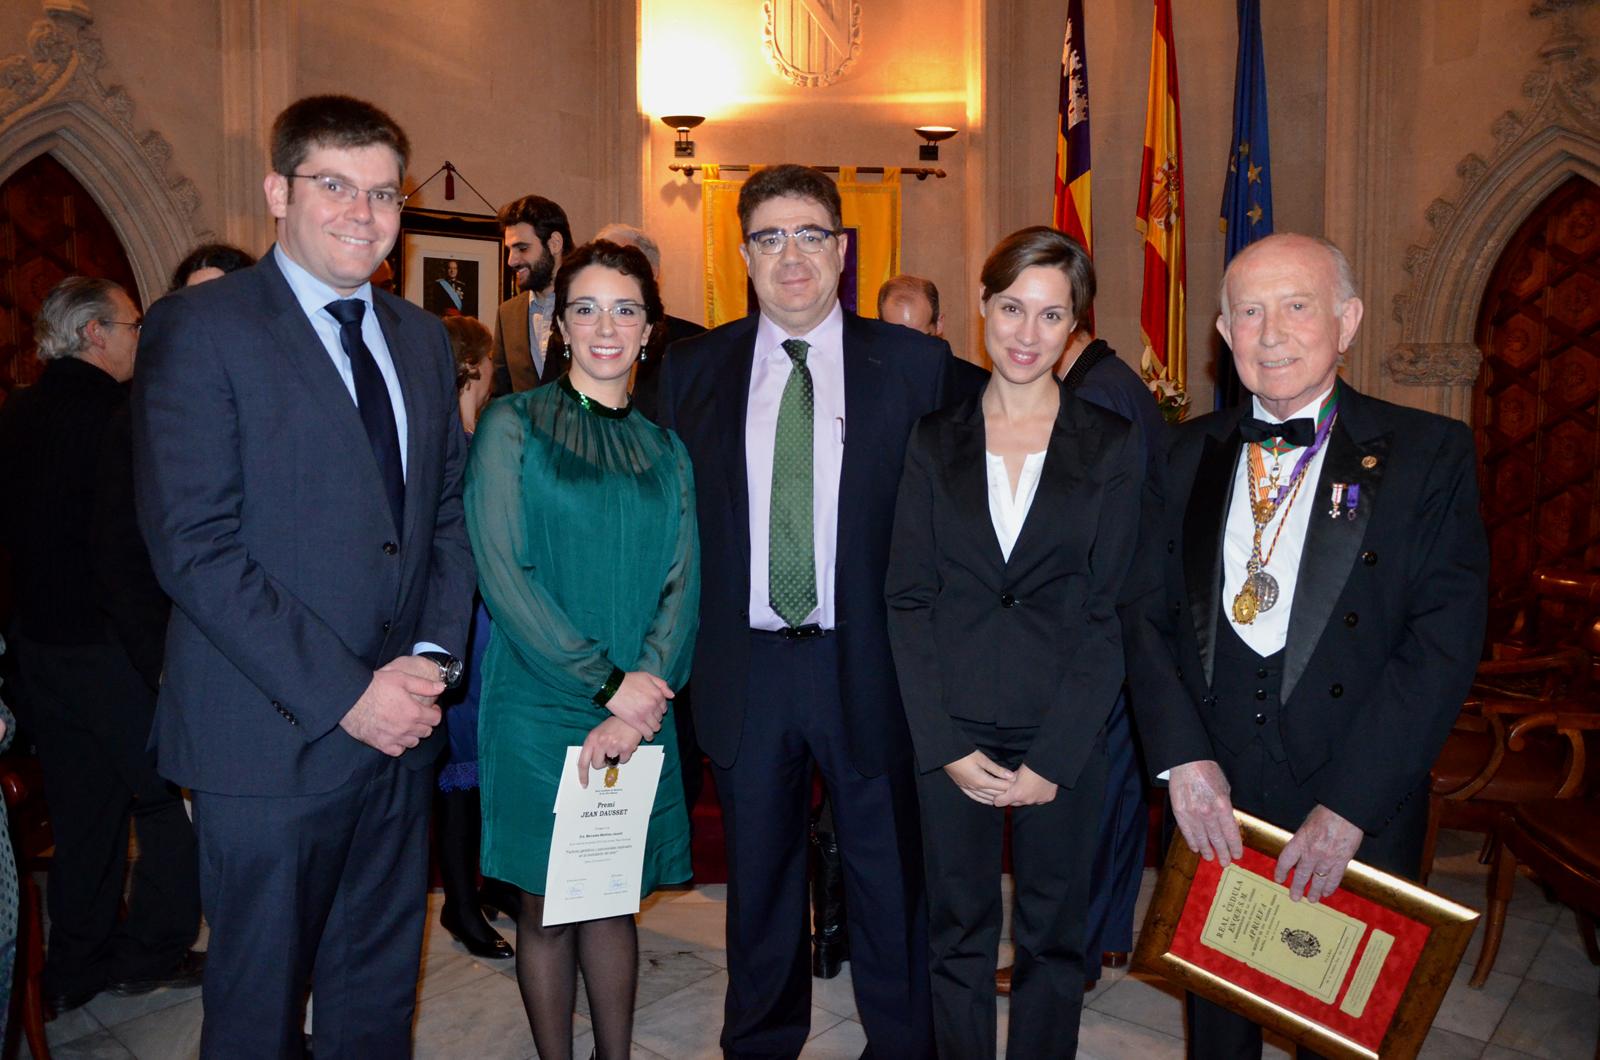 Martí Sansaloni (conseller de Salut), Mercedes Martínez (premio Jean Dausset), Antoni Bennassar (presidente del Col·legi de Metges), Auxi Santandreu (Patronat Científic) y Alfonso Ballesteros (director del Patronat Científic).